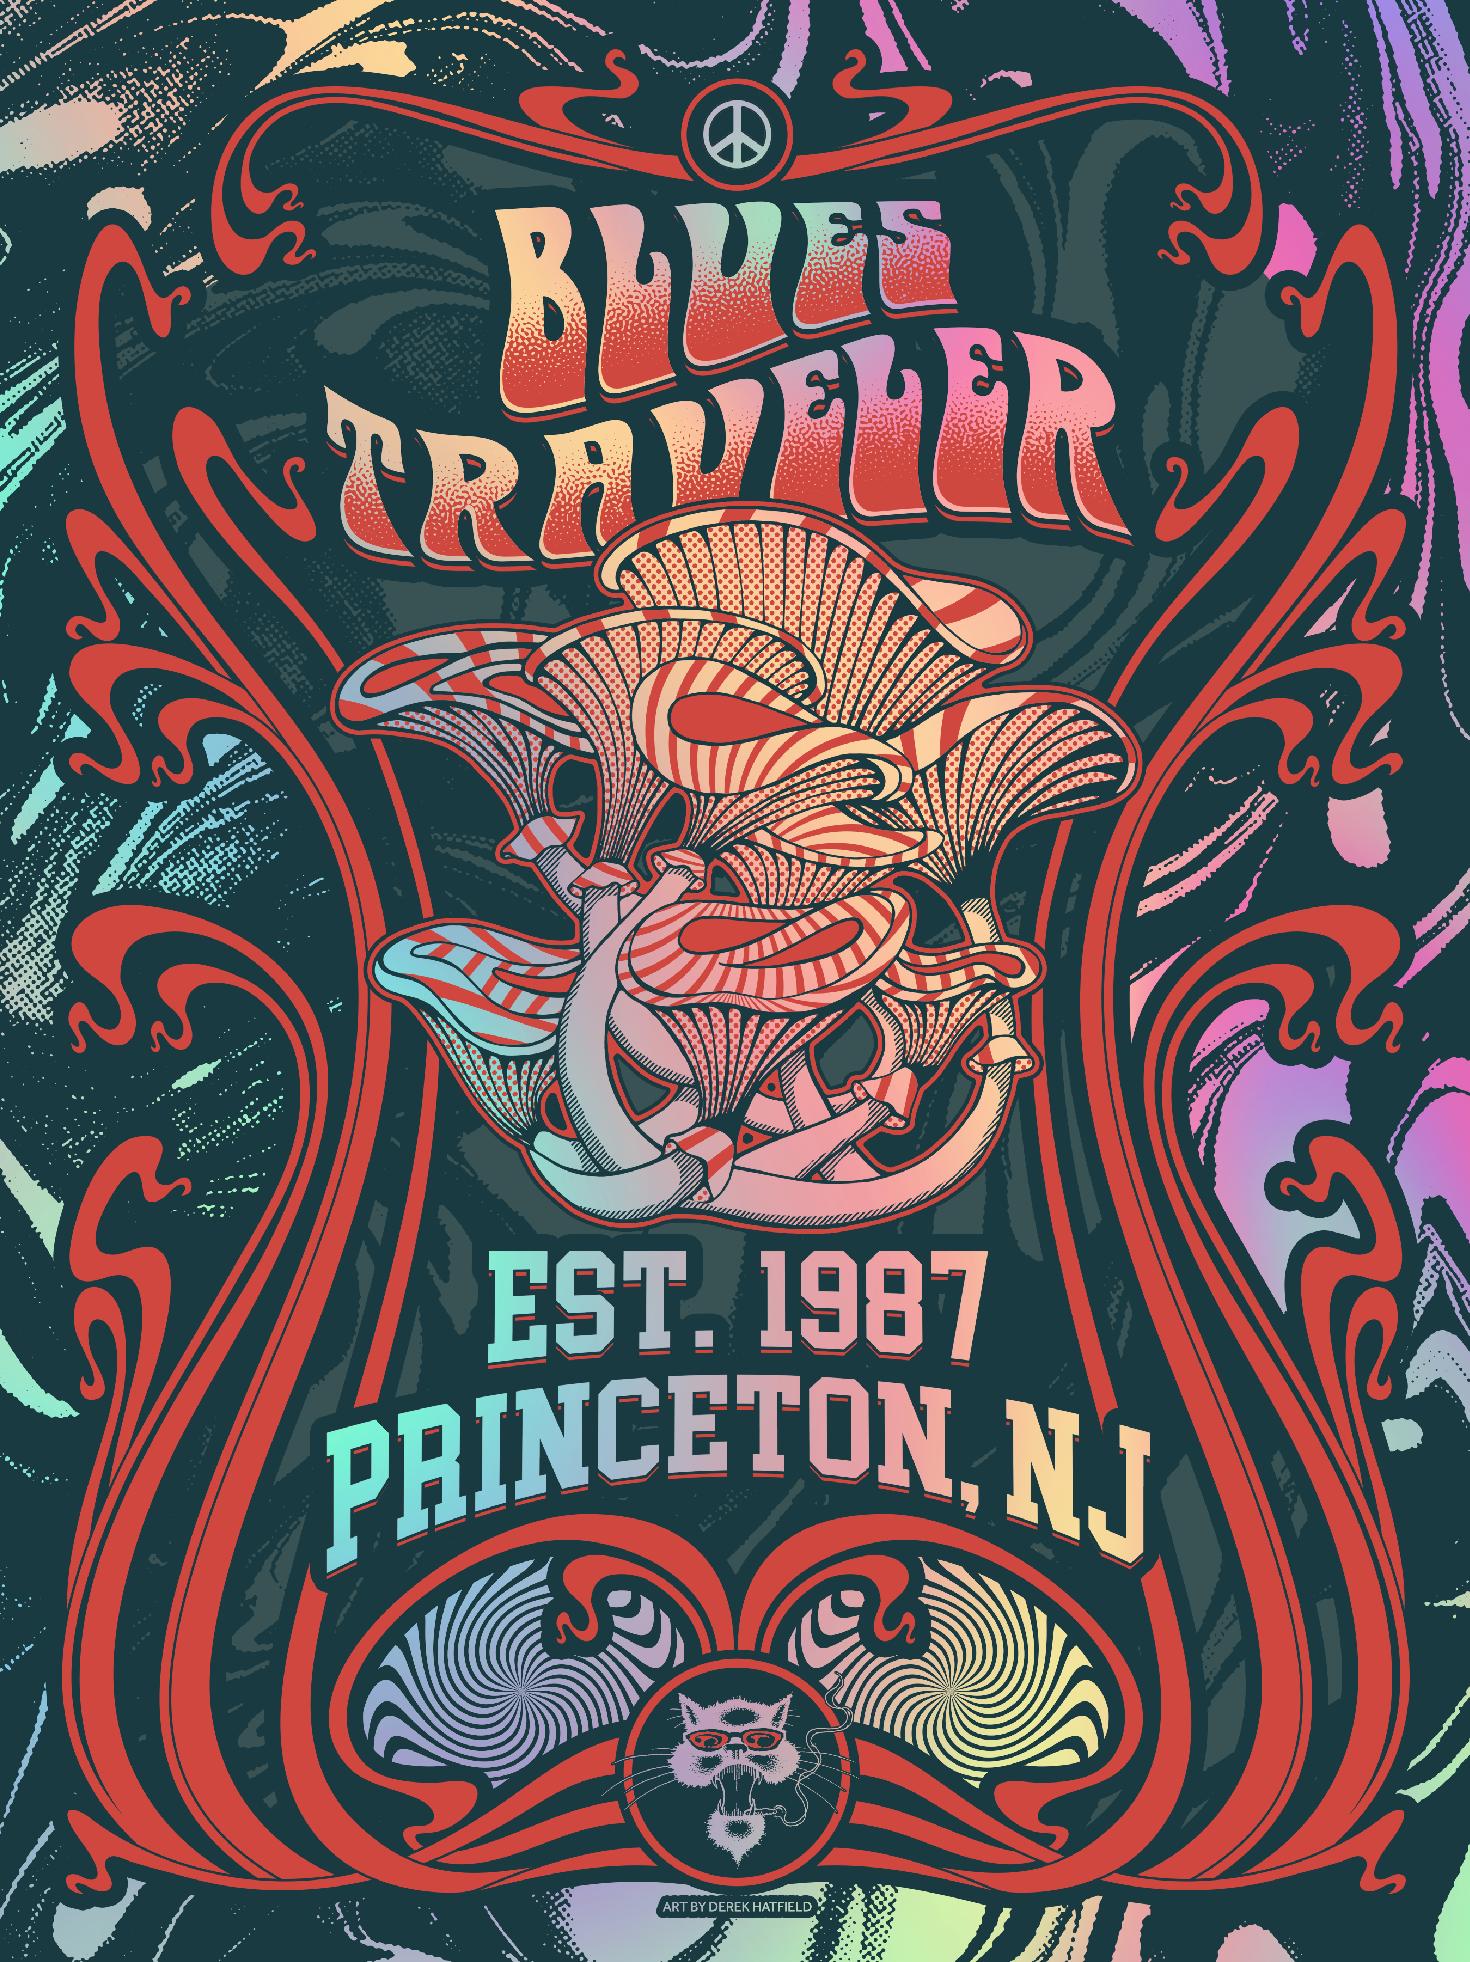 Blues Traveler - 3.2.18